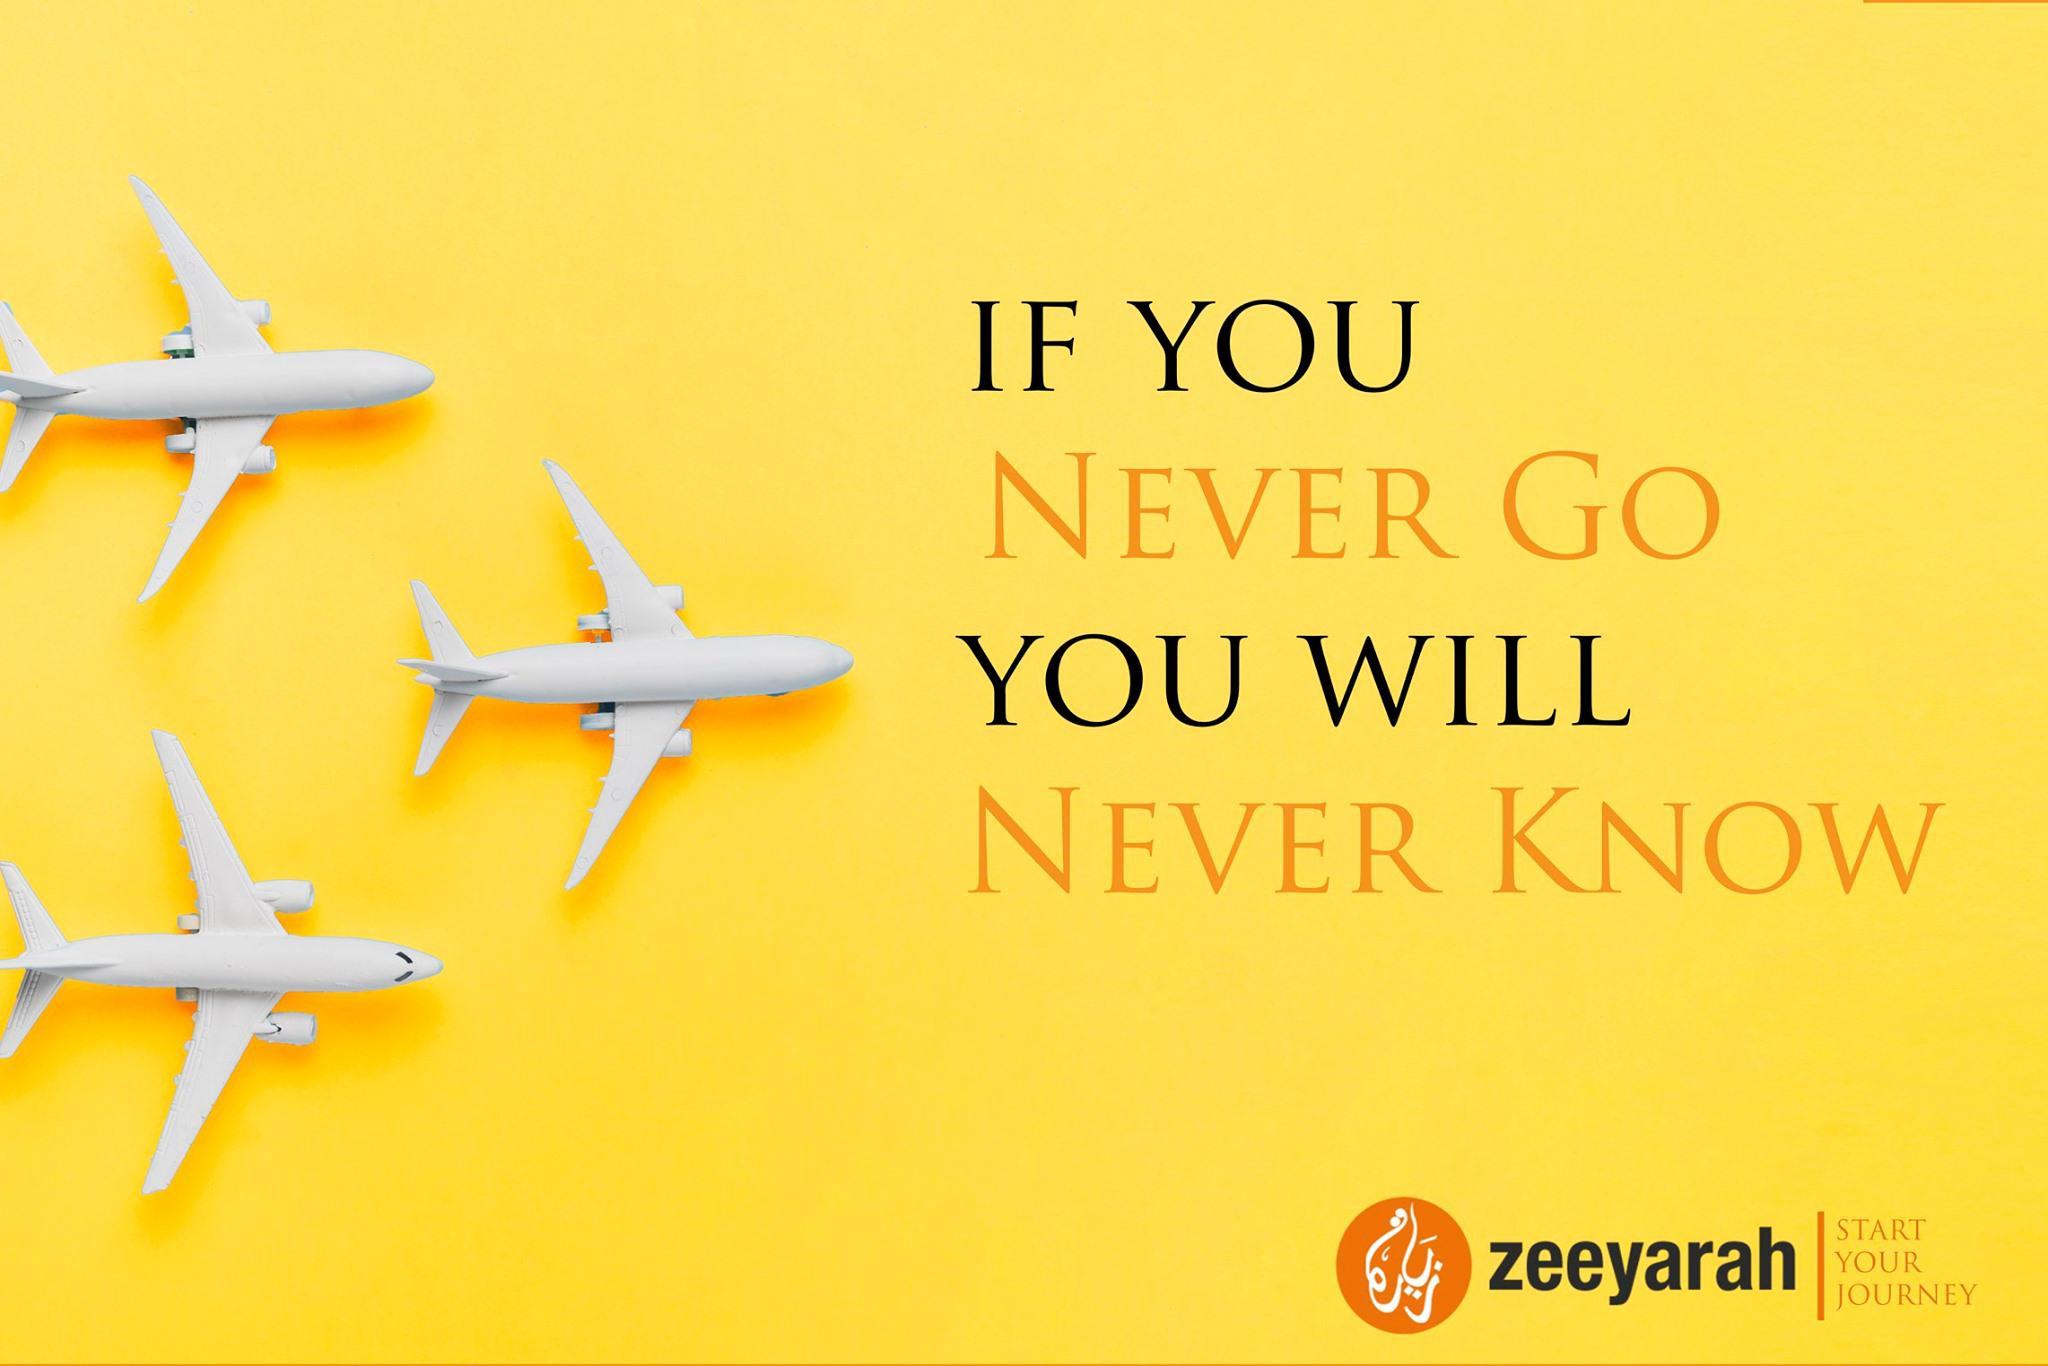 Zeeyarah